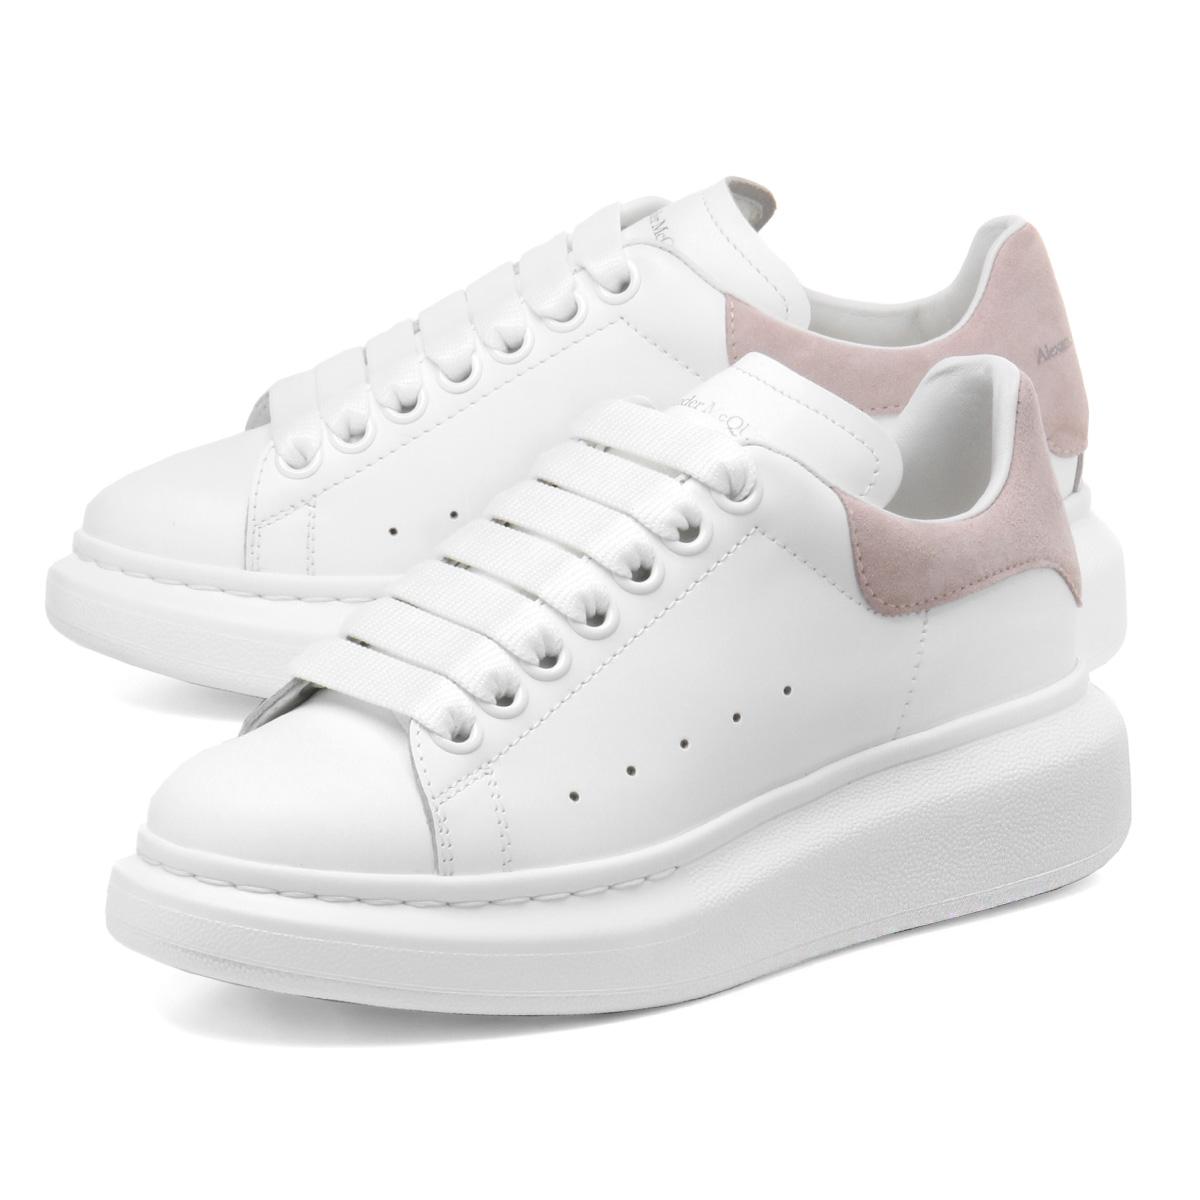 Alexander McQueen ALEXANDER McQUEEN shoes Lady's 553770 WHGP7 9182 sneakers  WHITE/PATCHOULI white